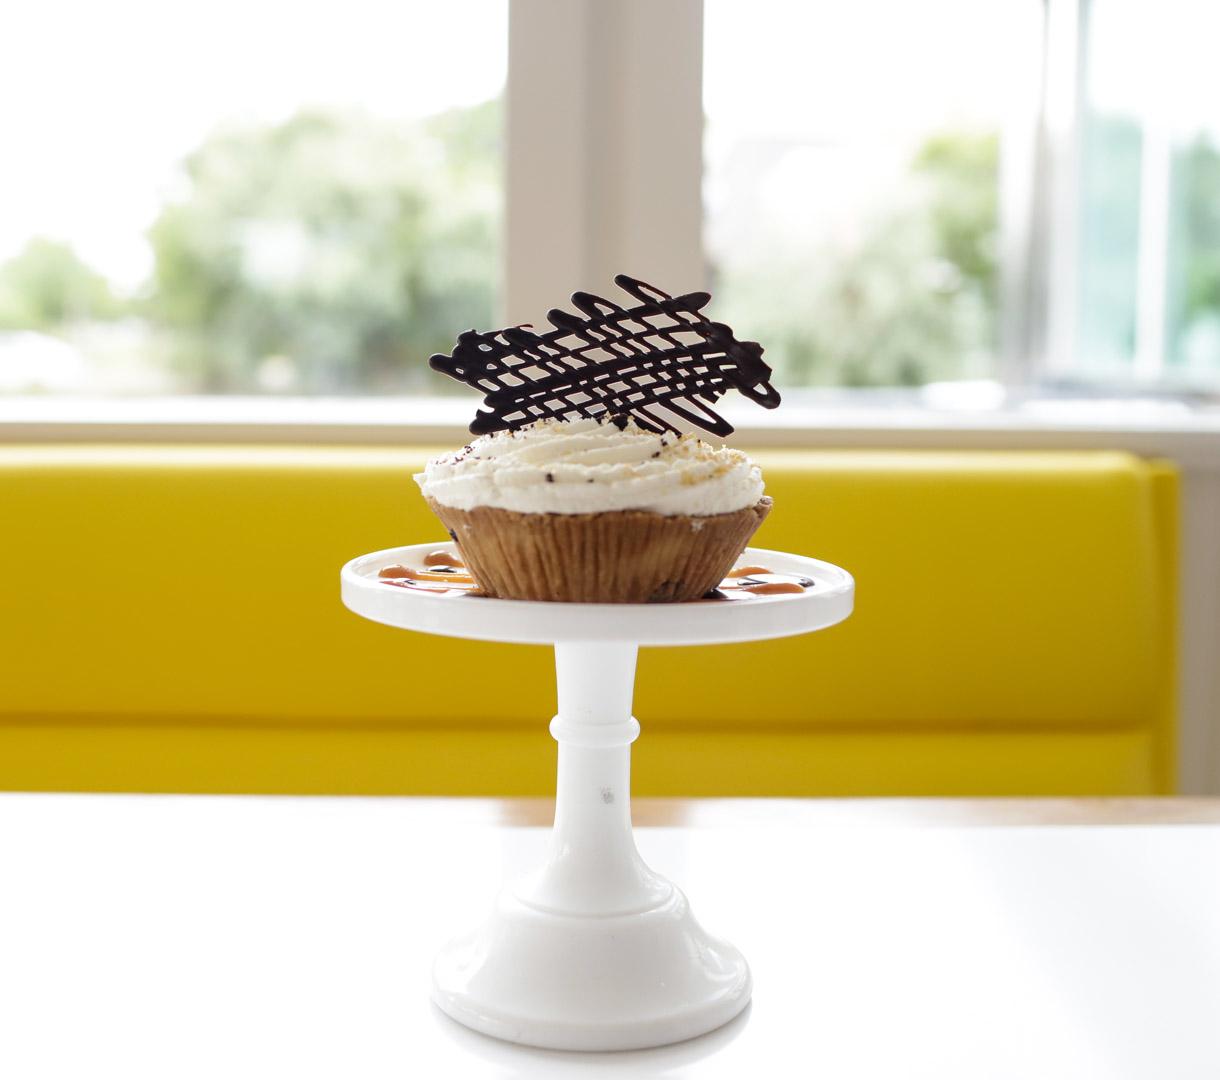 silver-lining-diner-banana-cream-pie.jpg